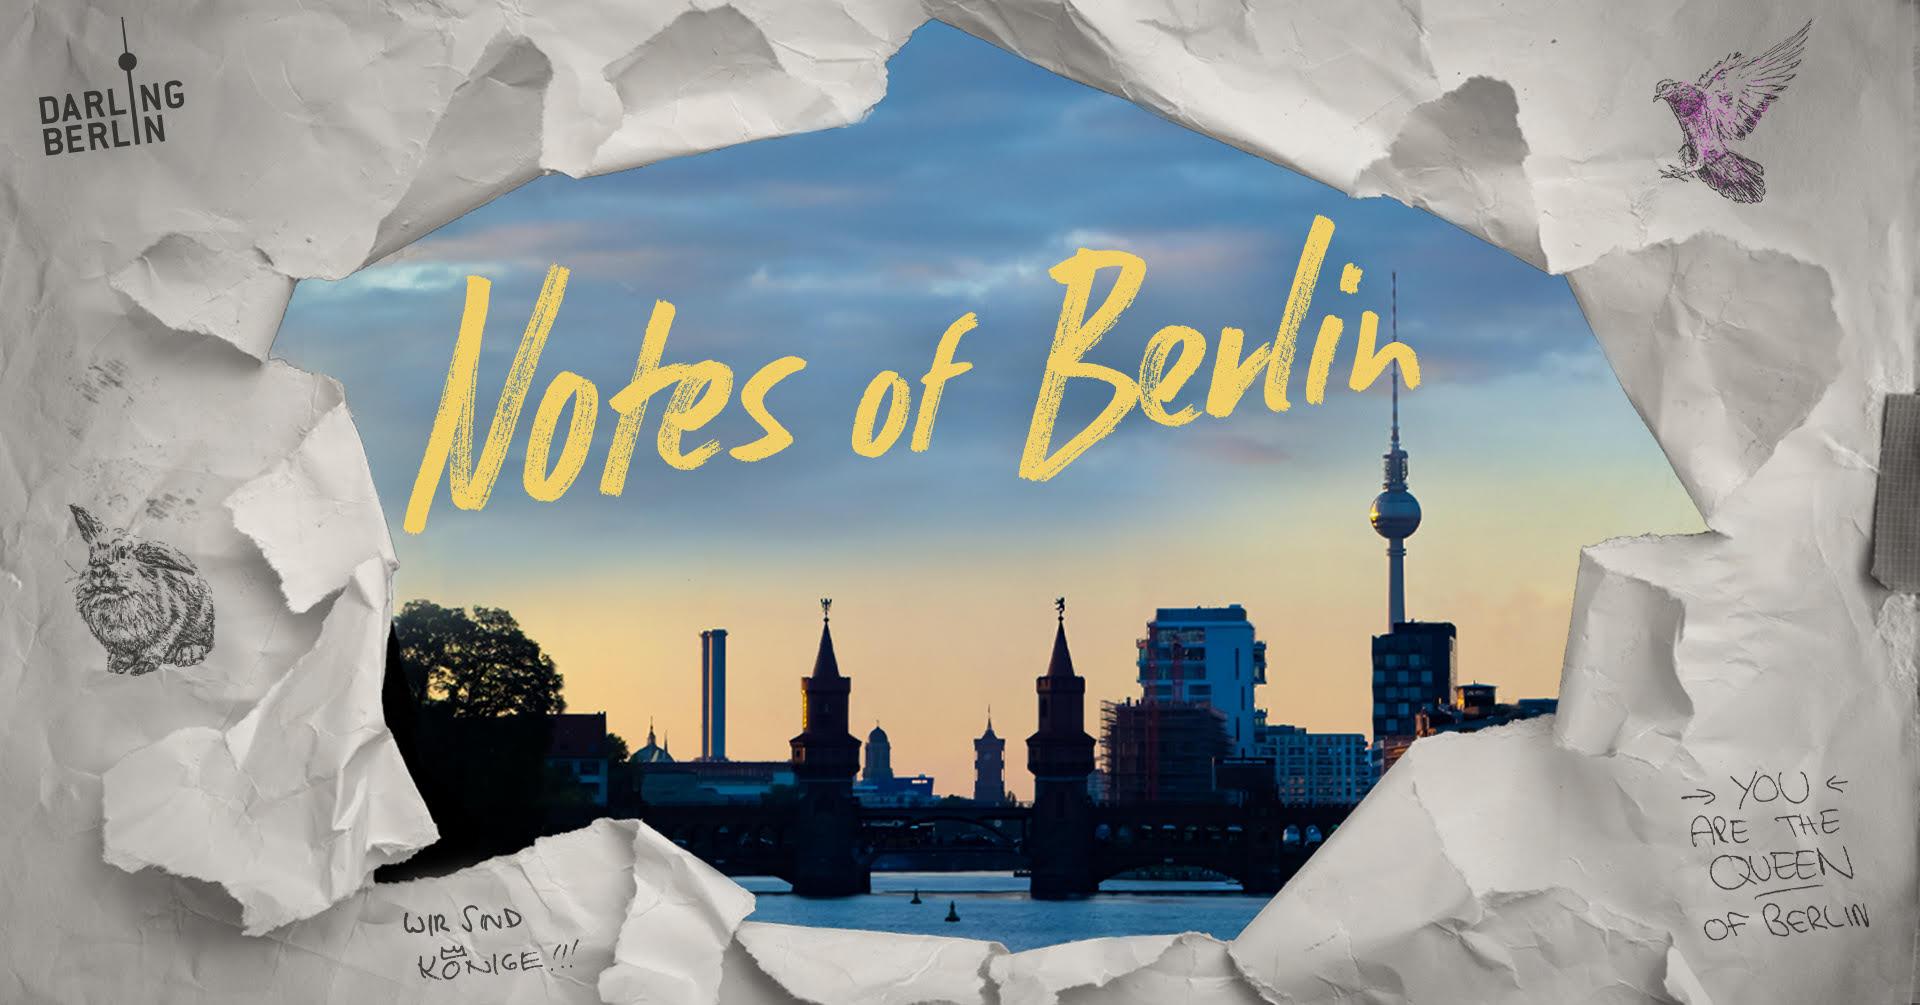 Saturday 3.07.21 – 21:45: Kiezkino Charlottenburg: Notes of Berlin I Open Air Preview